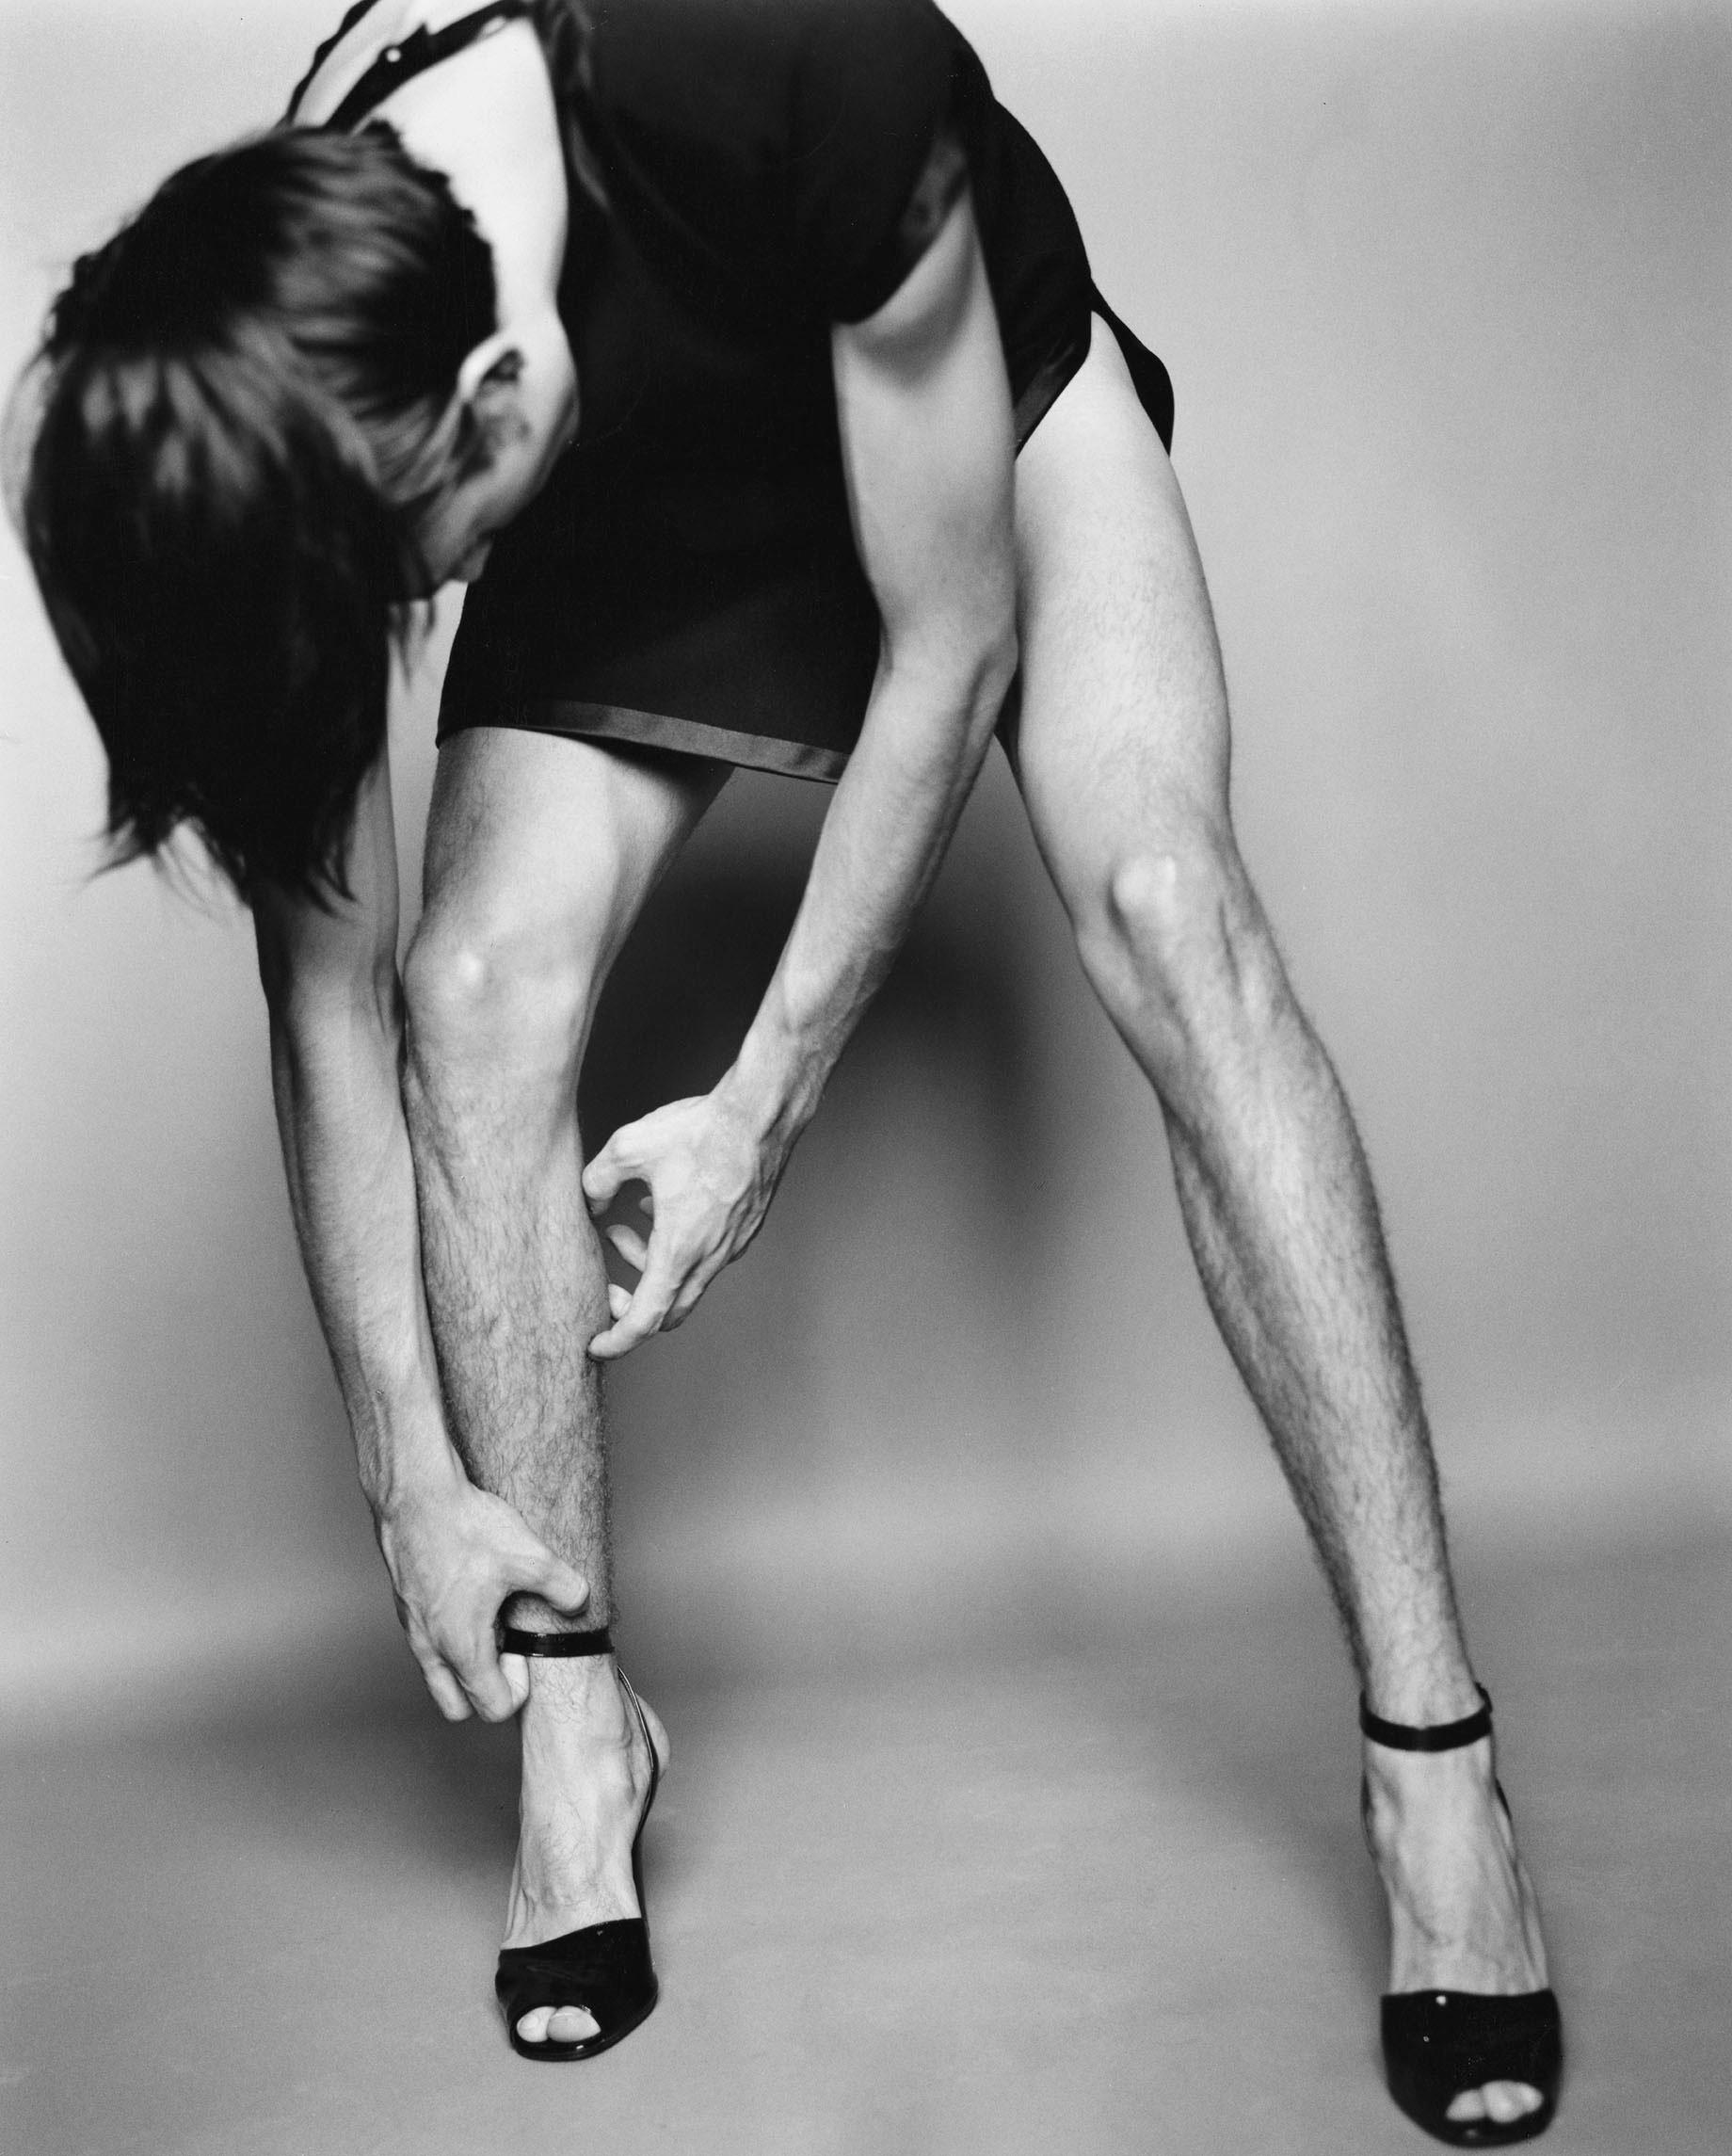 Taber Schroeder, Paris, Visionaire, 1996.